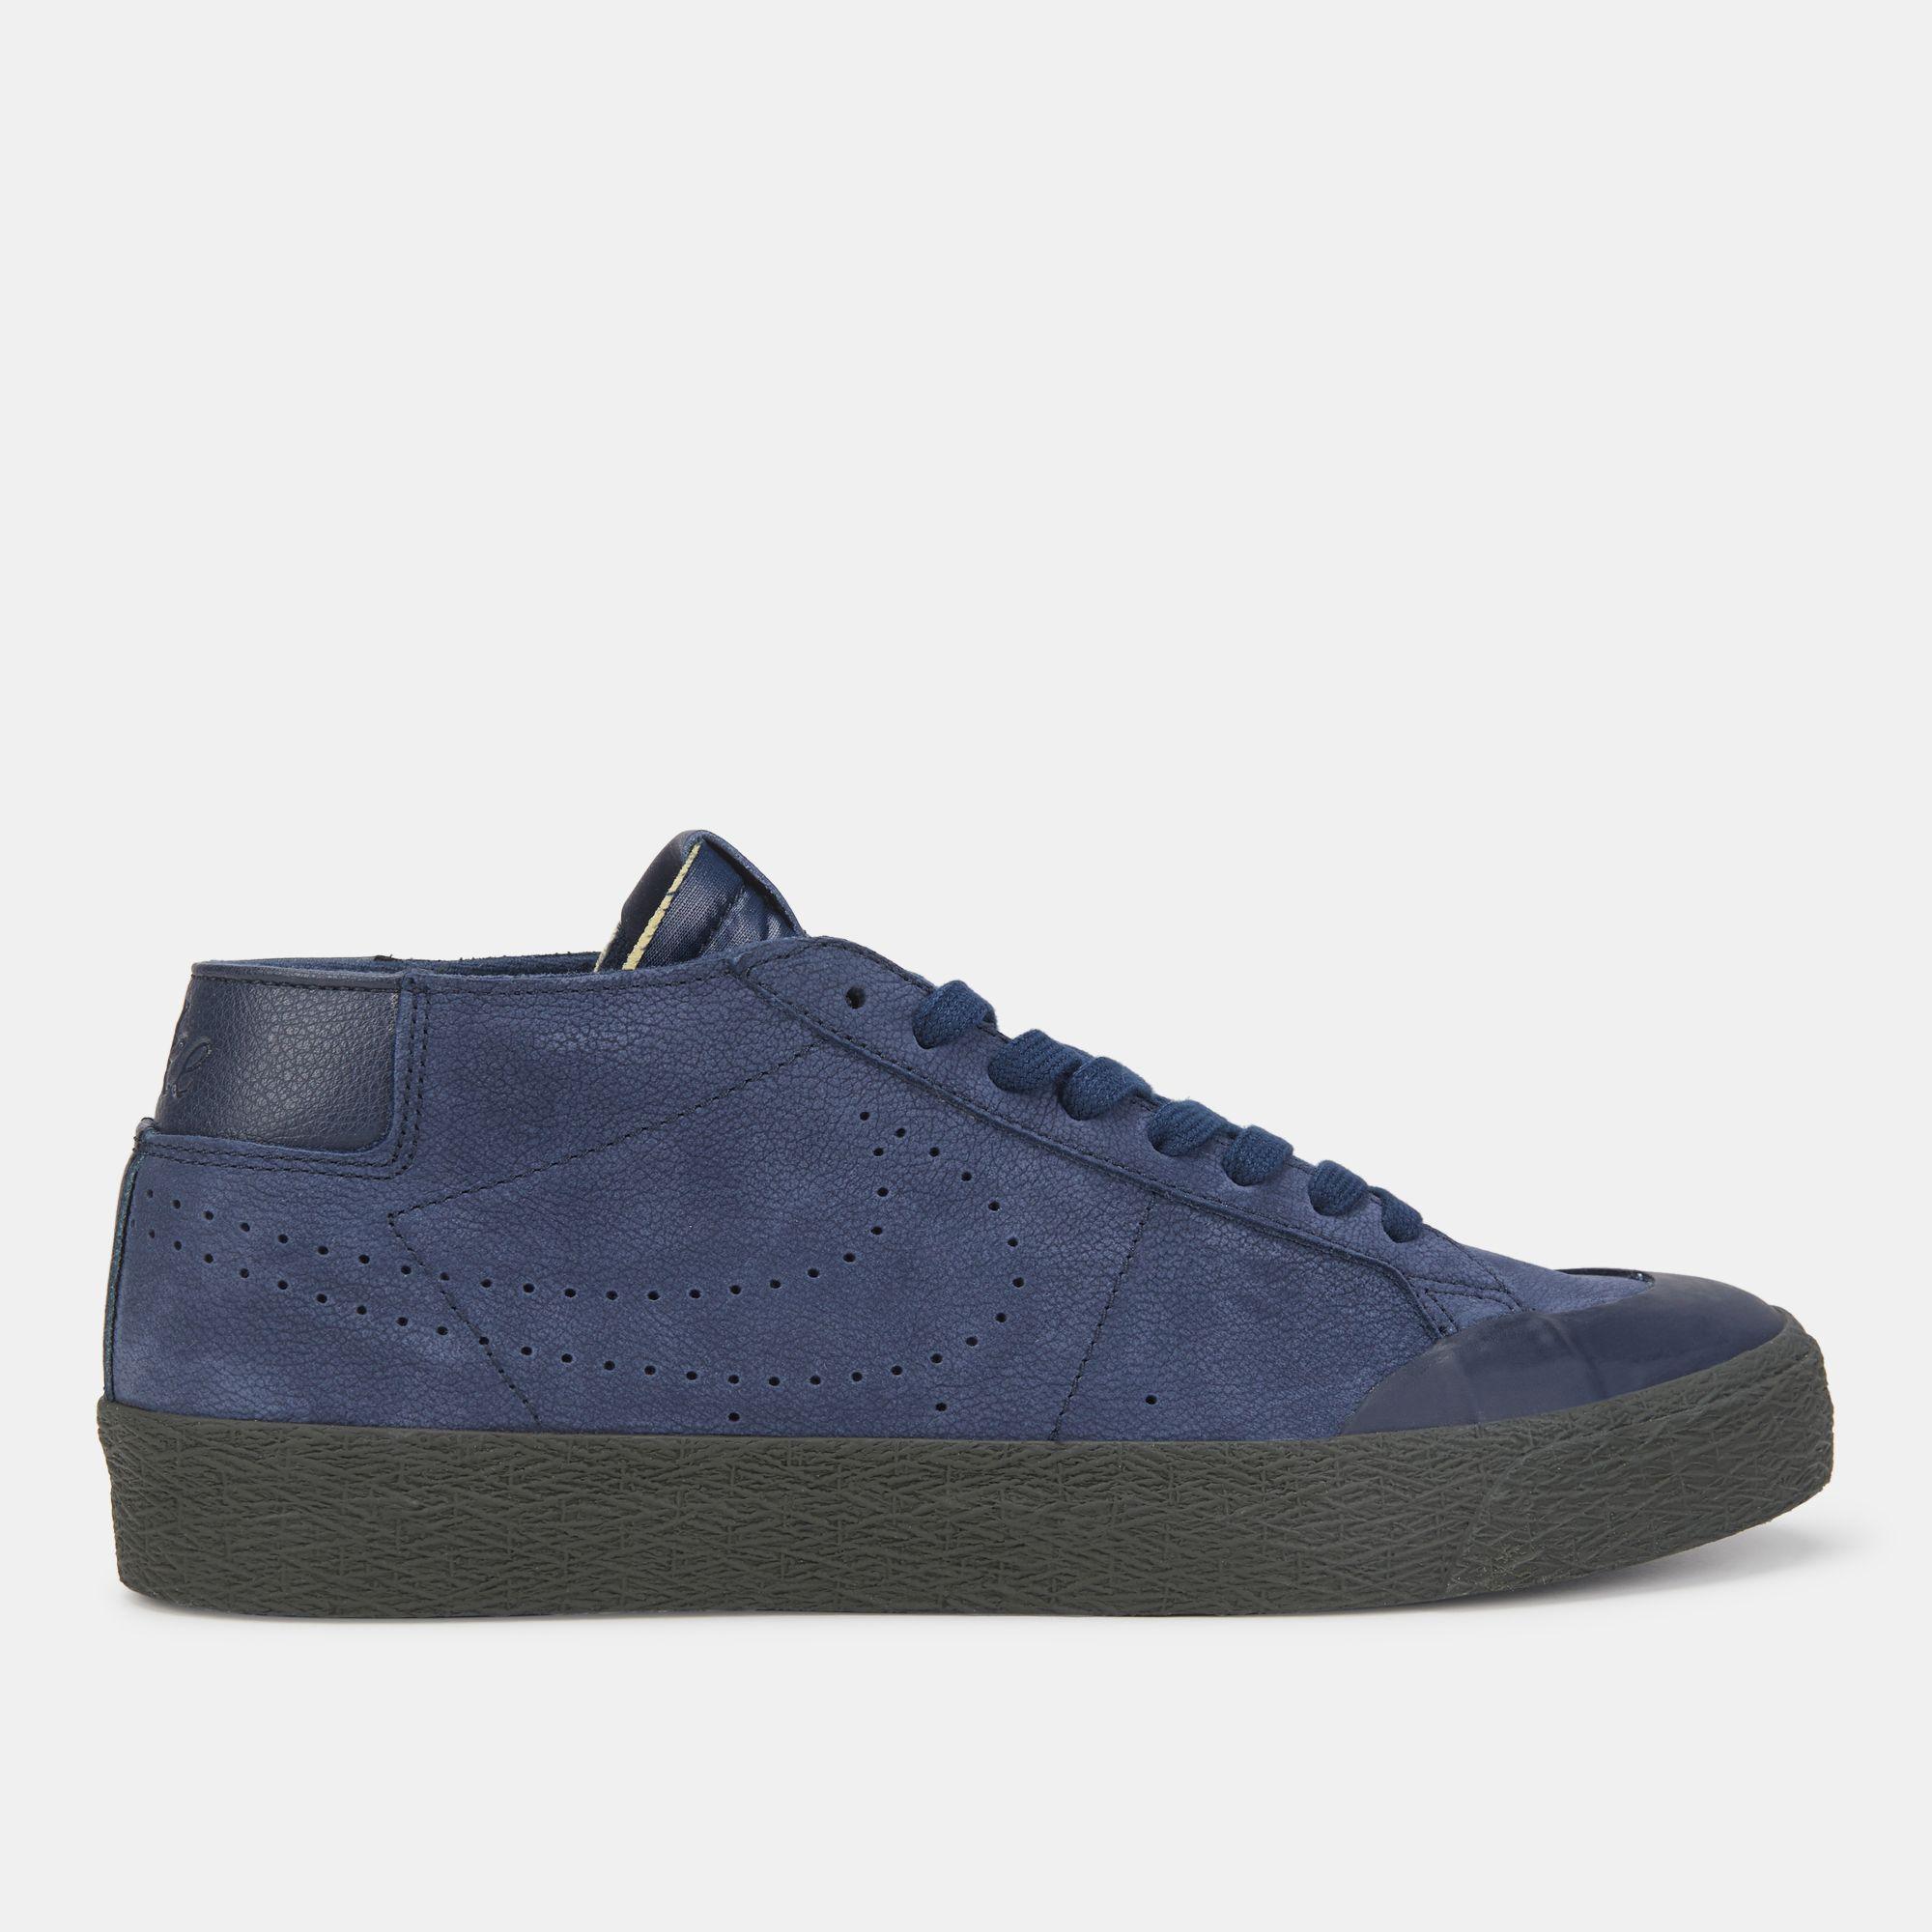 67be1e053bf95 Nike SB Zoom Blazer Chukka XT Premium Skateboarding Shoe